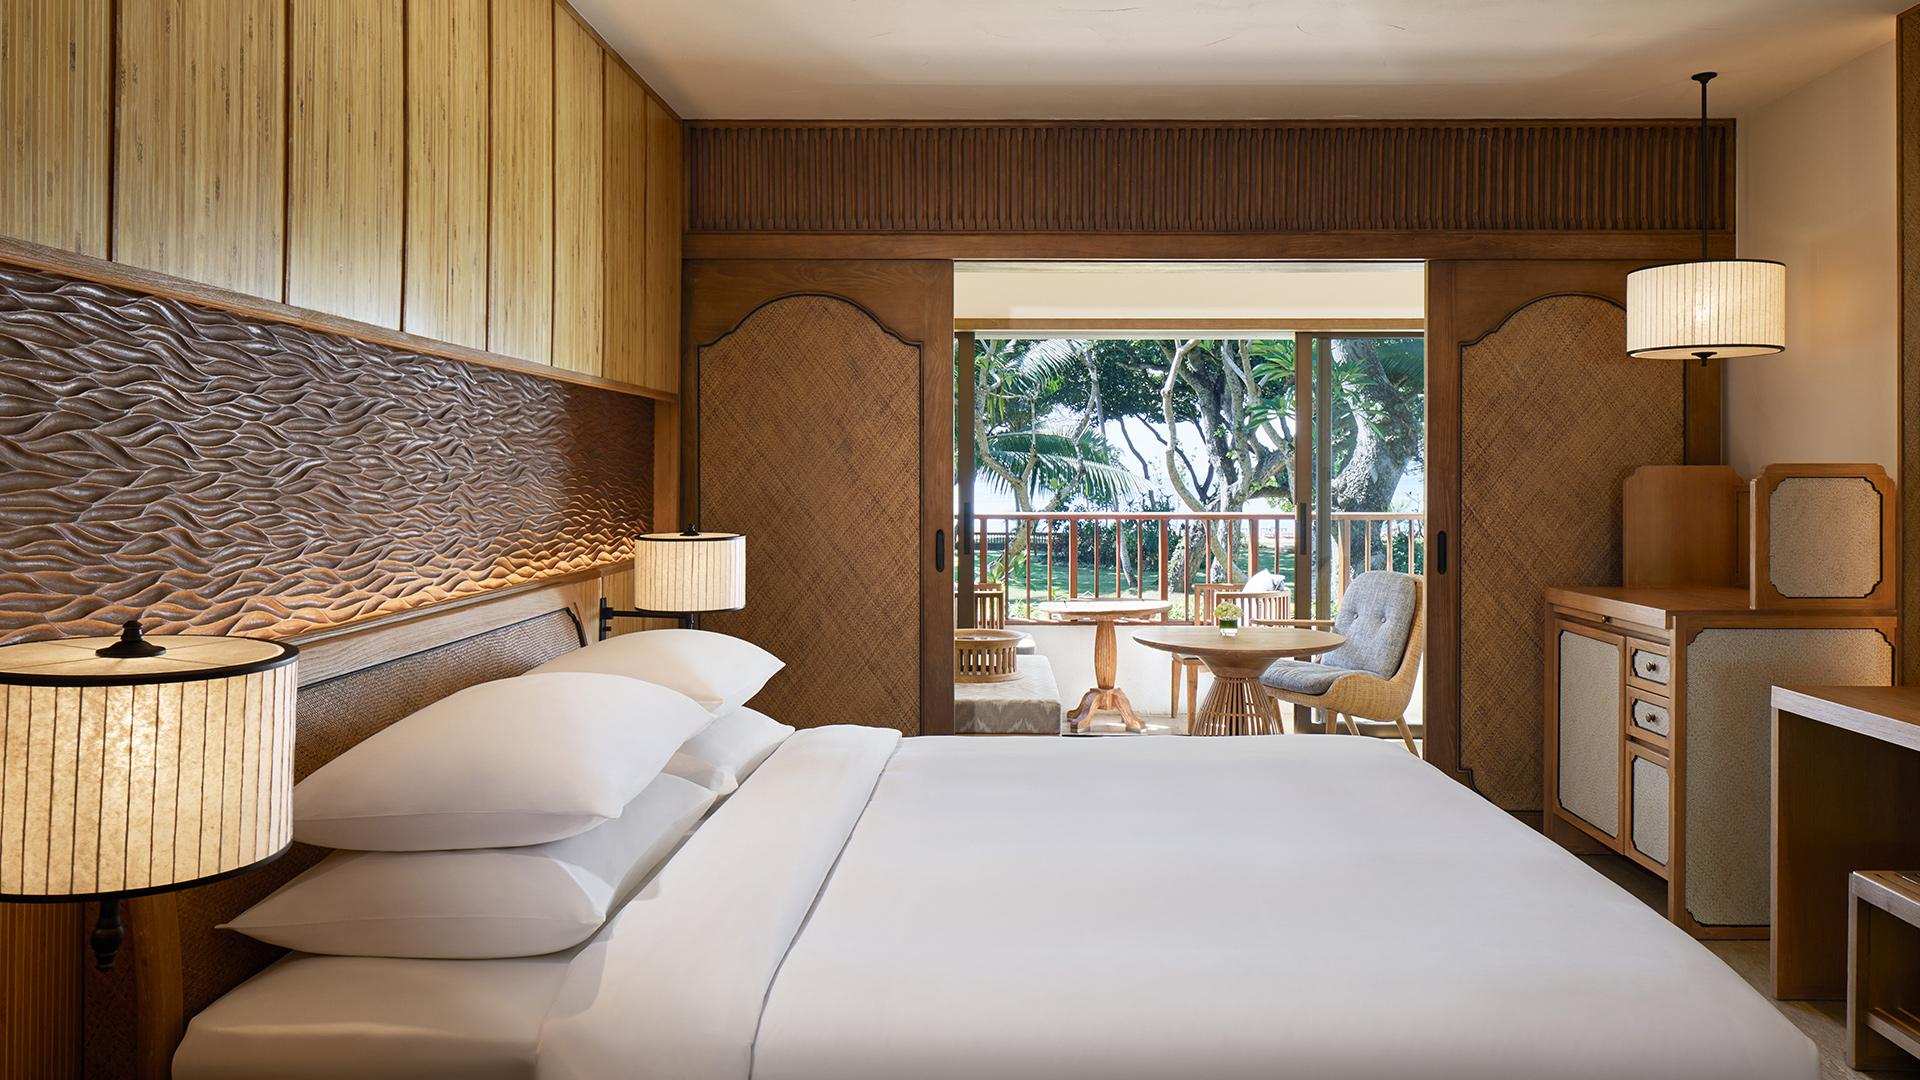 Deluxe Room image 1 at Hyatt Regency Bali by Kota Denpasar, Bali, Indonesia